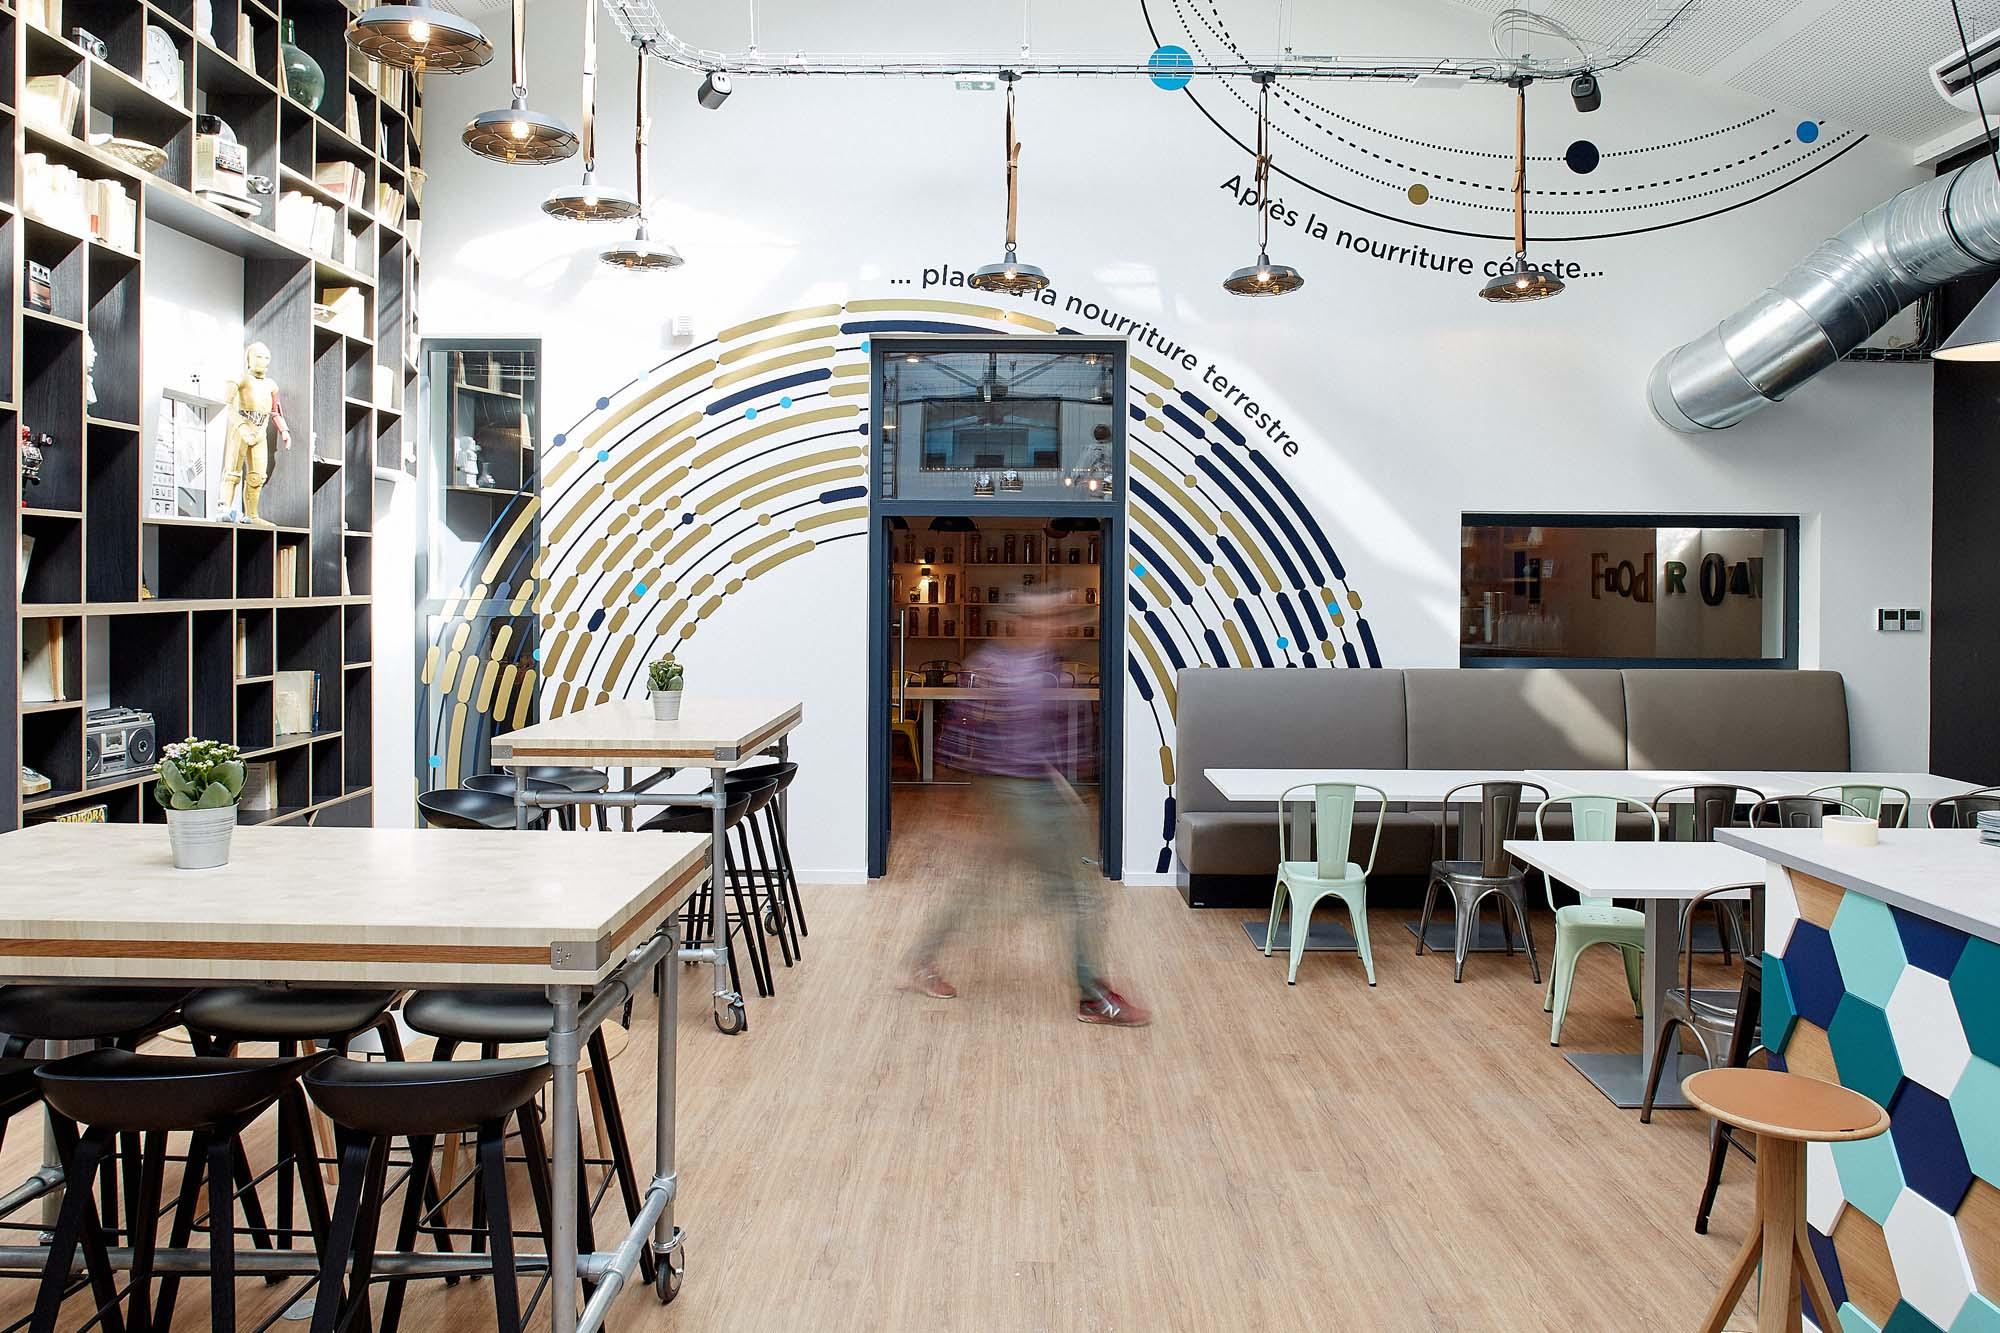 Comet Meetings, c'est 1475 m2, 16 salles, un restaurant